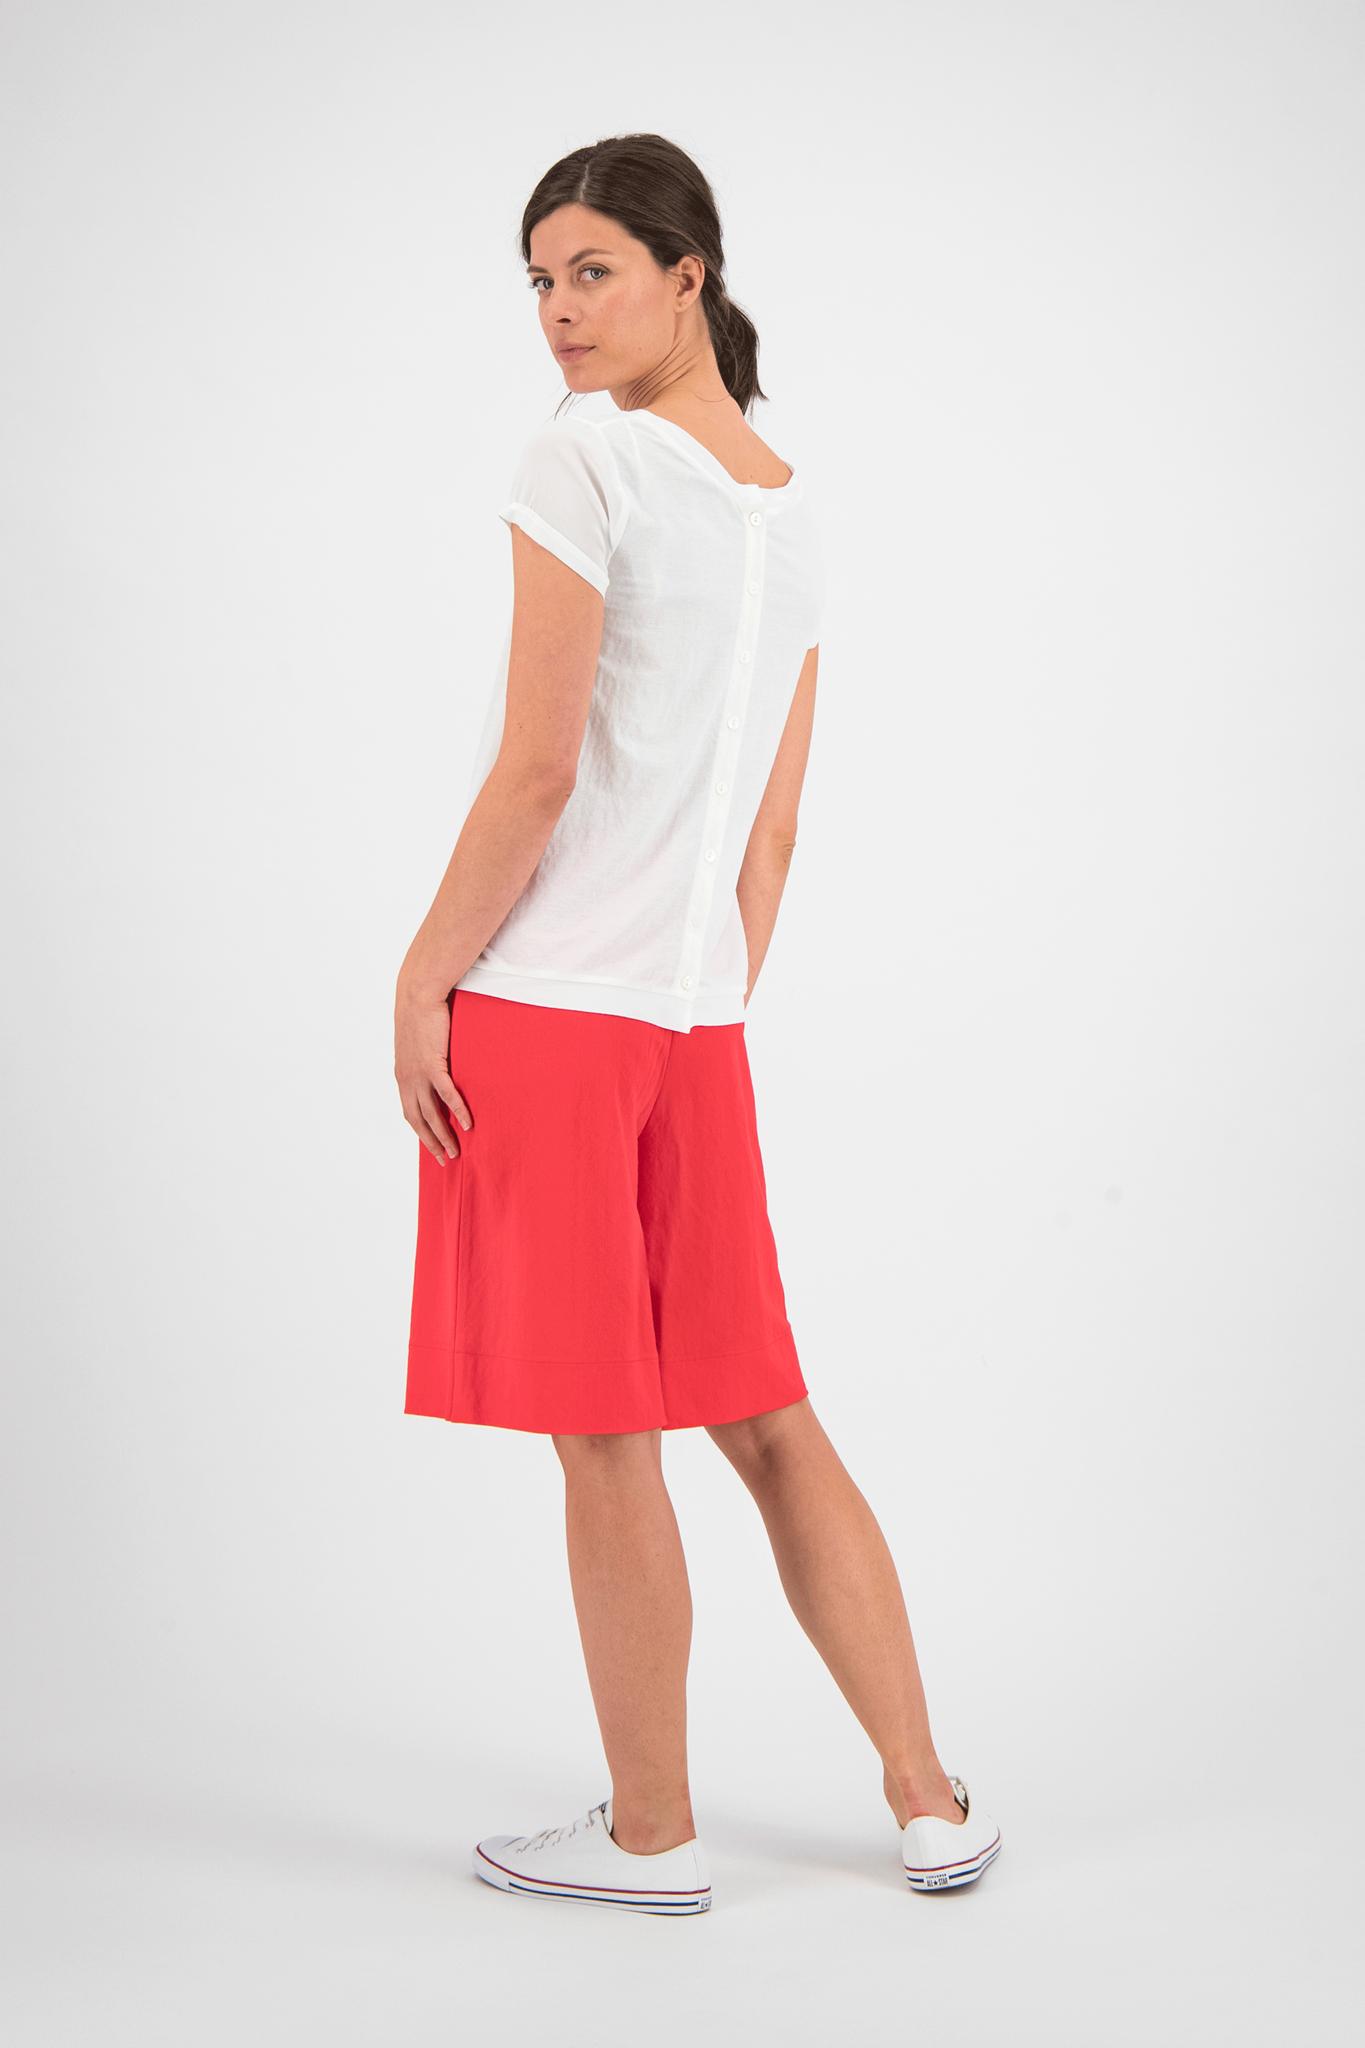 SYLVER Crêpe Stretch Skirt-Short - Koraalrood